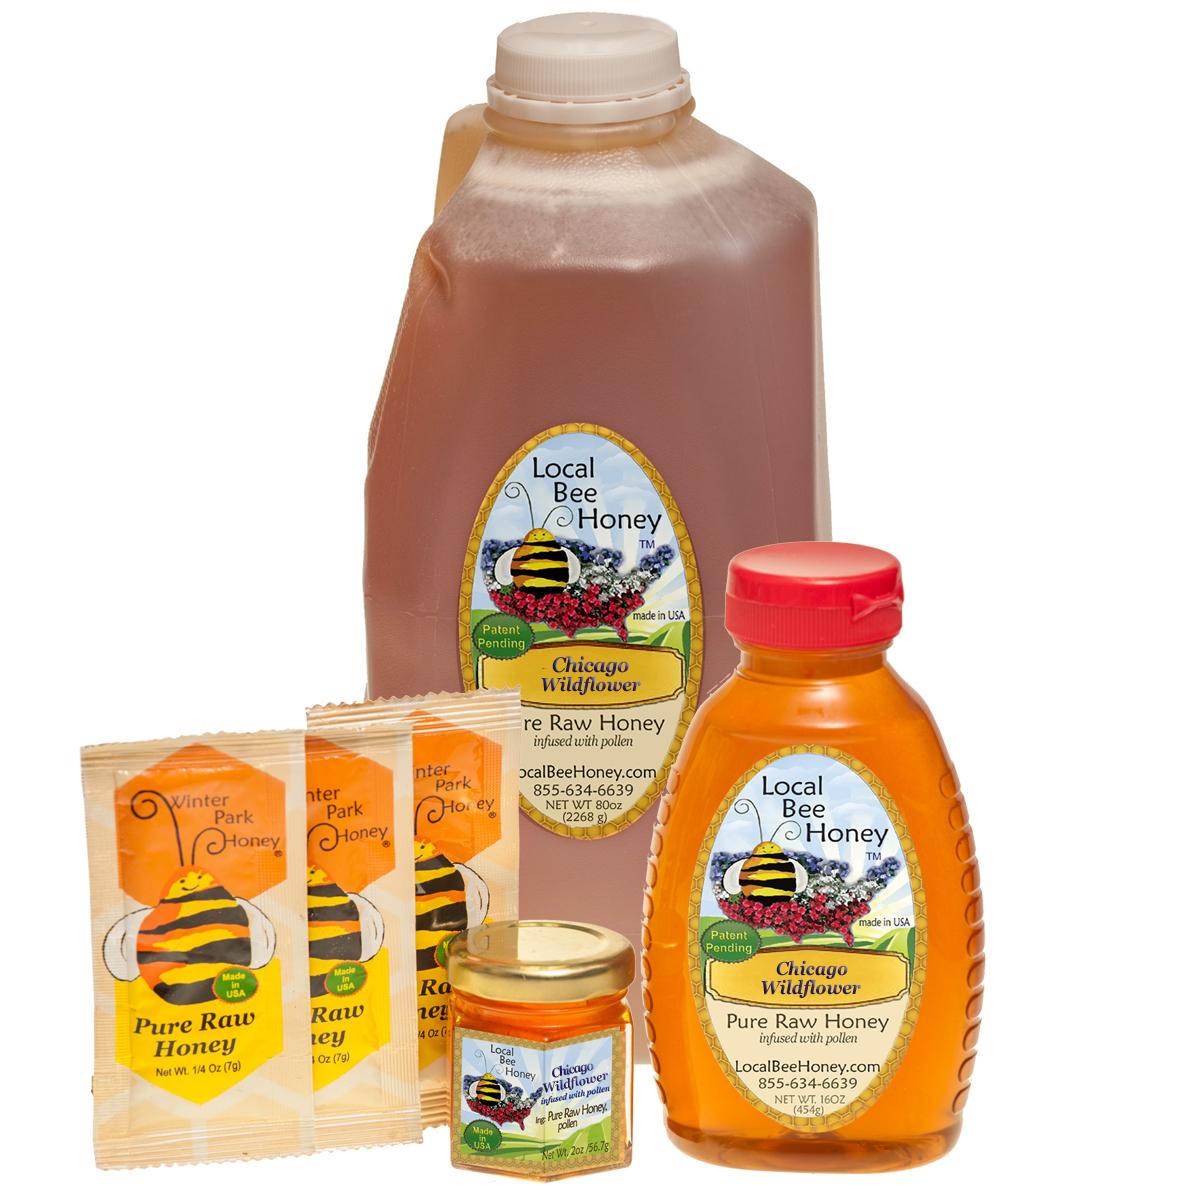 Chicago Wildflower Honey